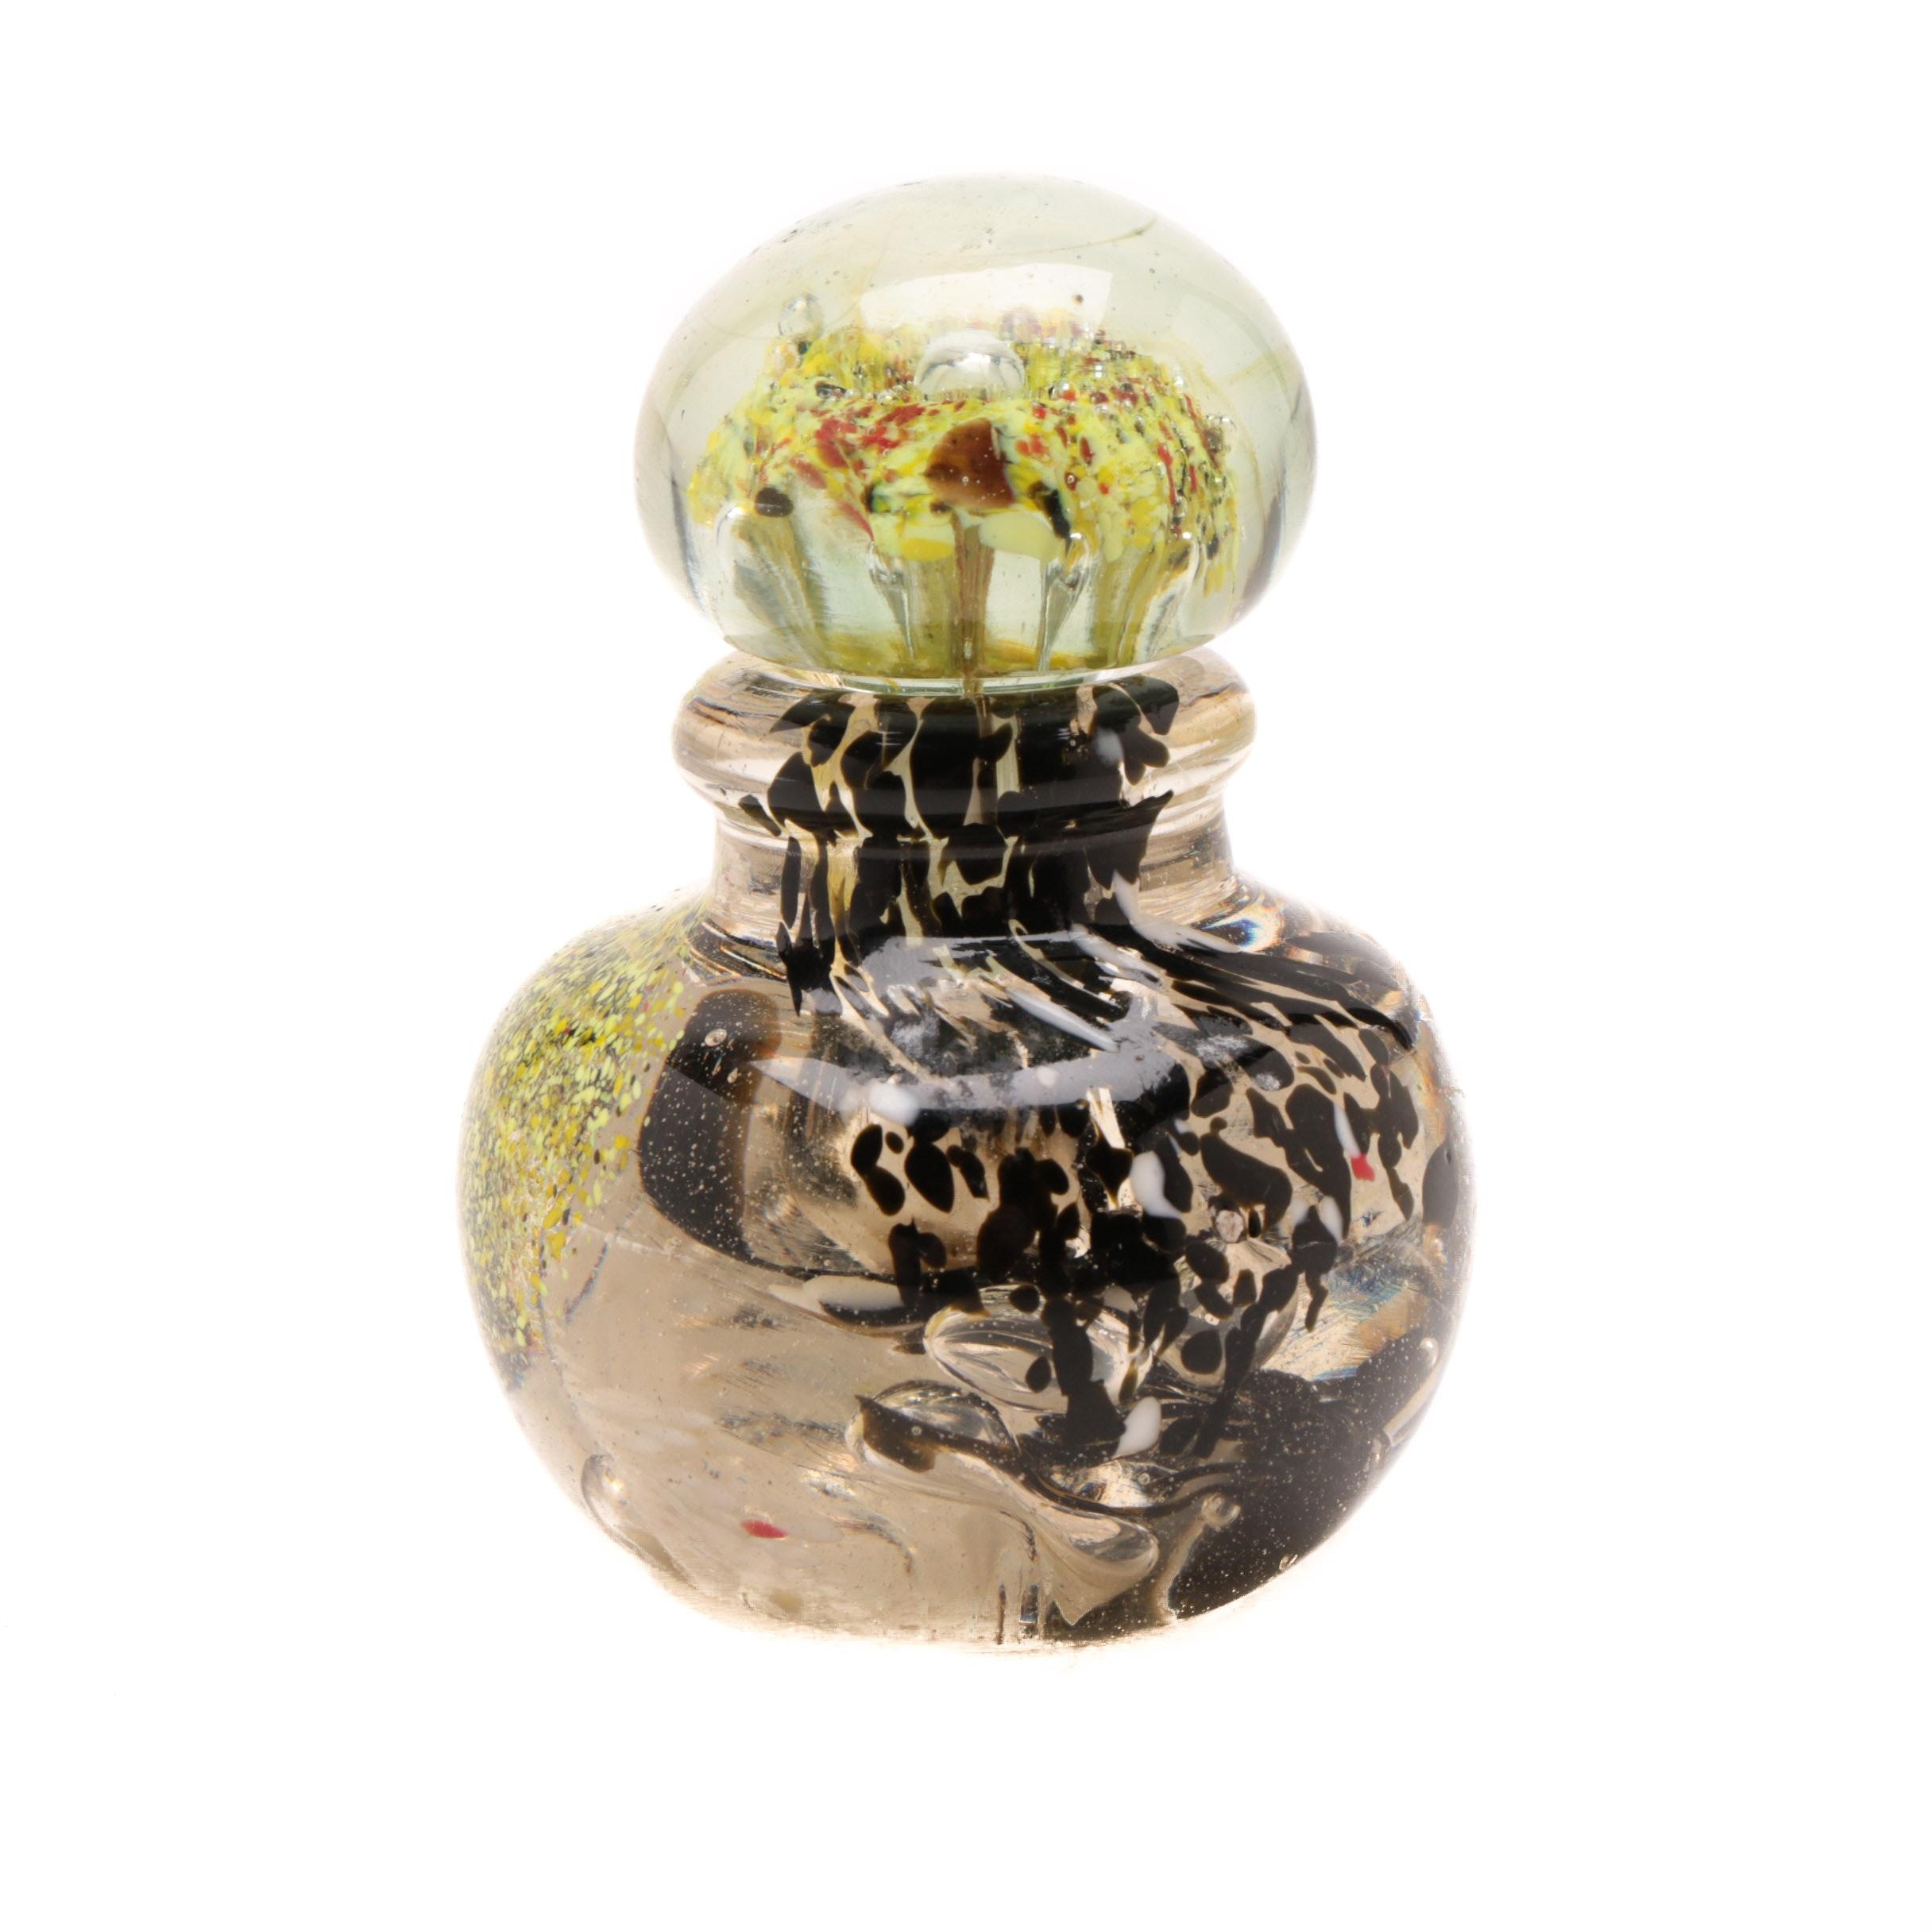 Cristalleria Stile d' Arte Murano Blown Glass Perfume Bottle with Stopper